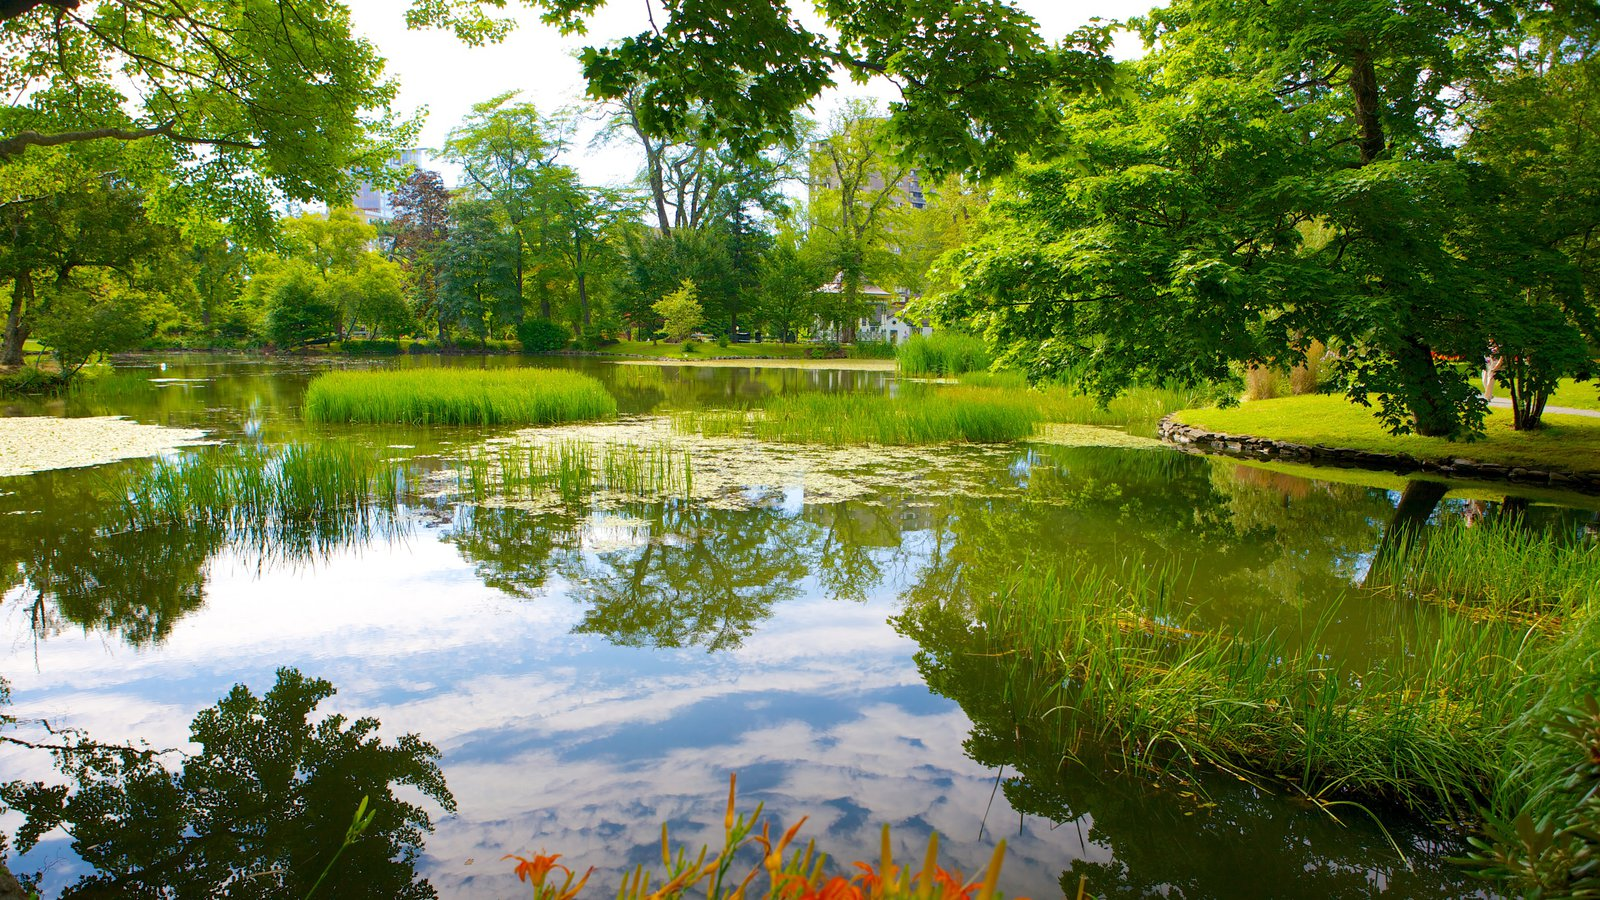 green lush halifax garden image and pond